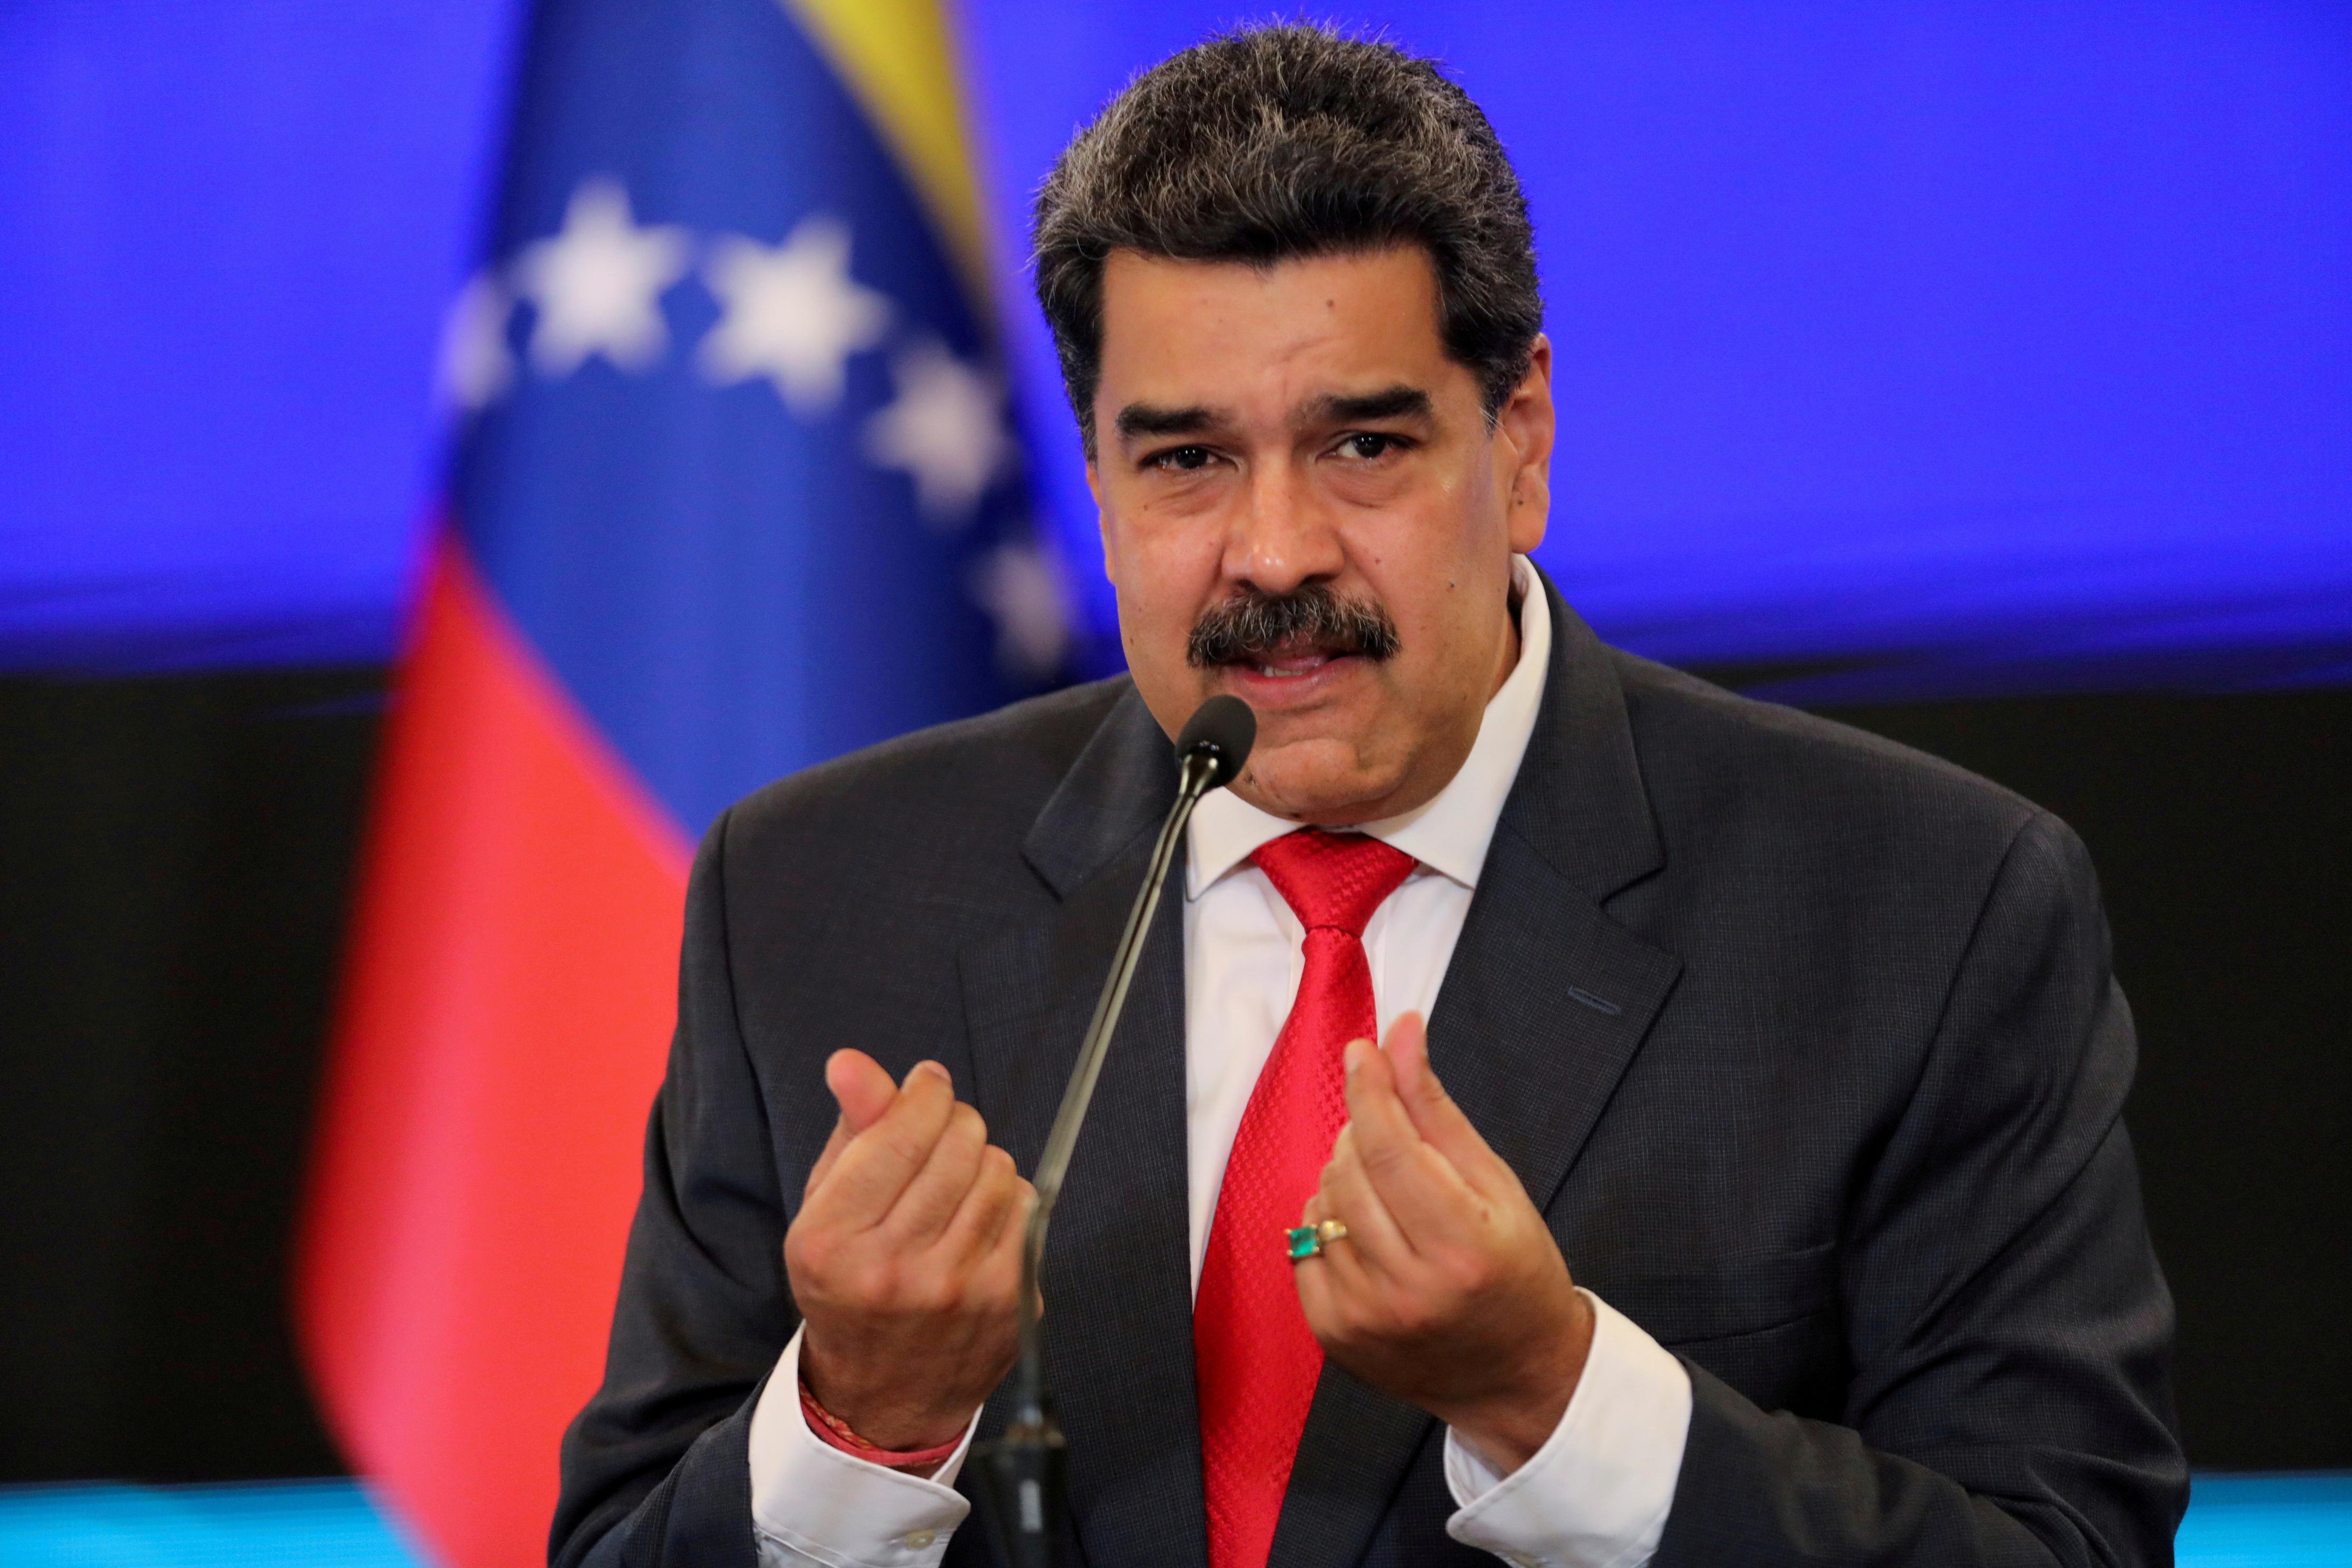 Venezuelan President Nicolas Maduro gestures as he speaks during a news conference in Caracas, Venezuela, December 8, 2020. REUTERS/Manaure Quintero/File Photo